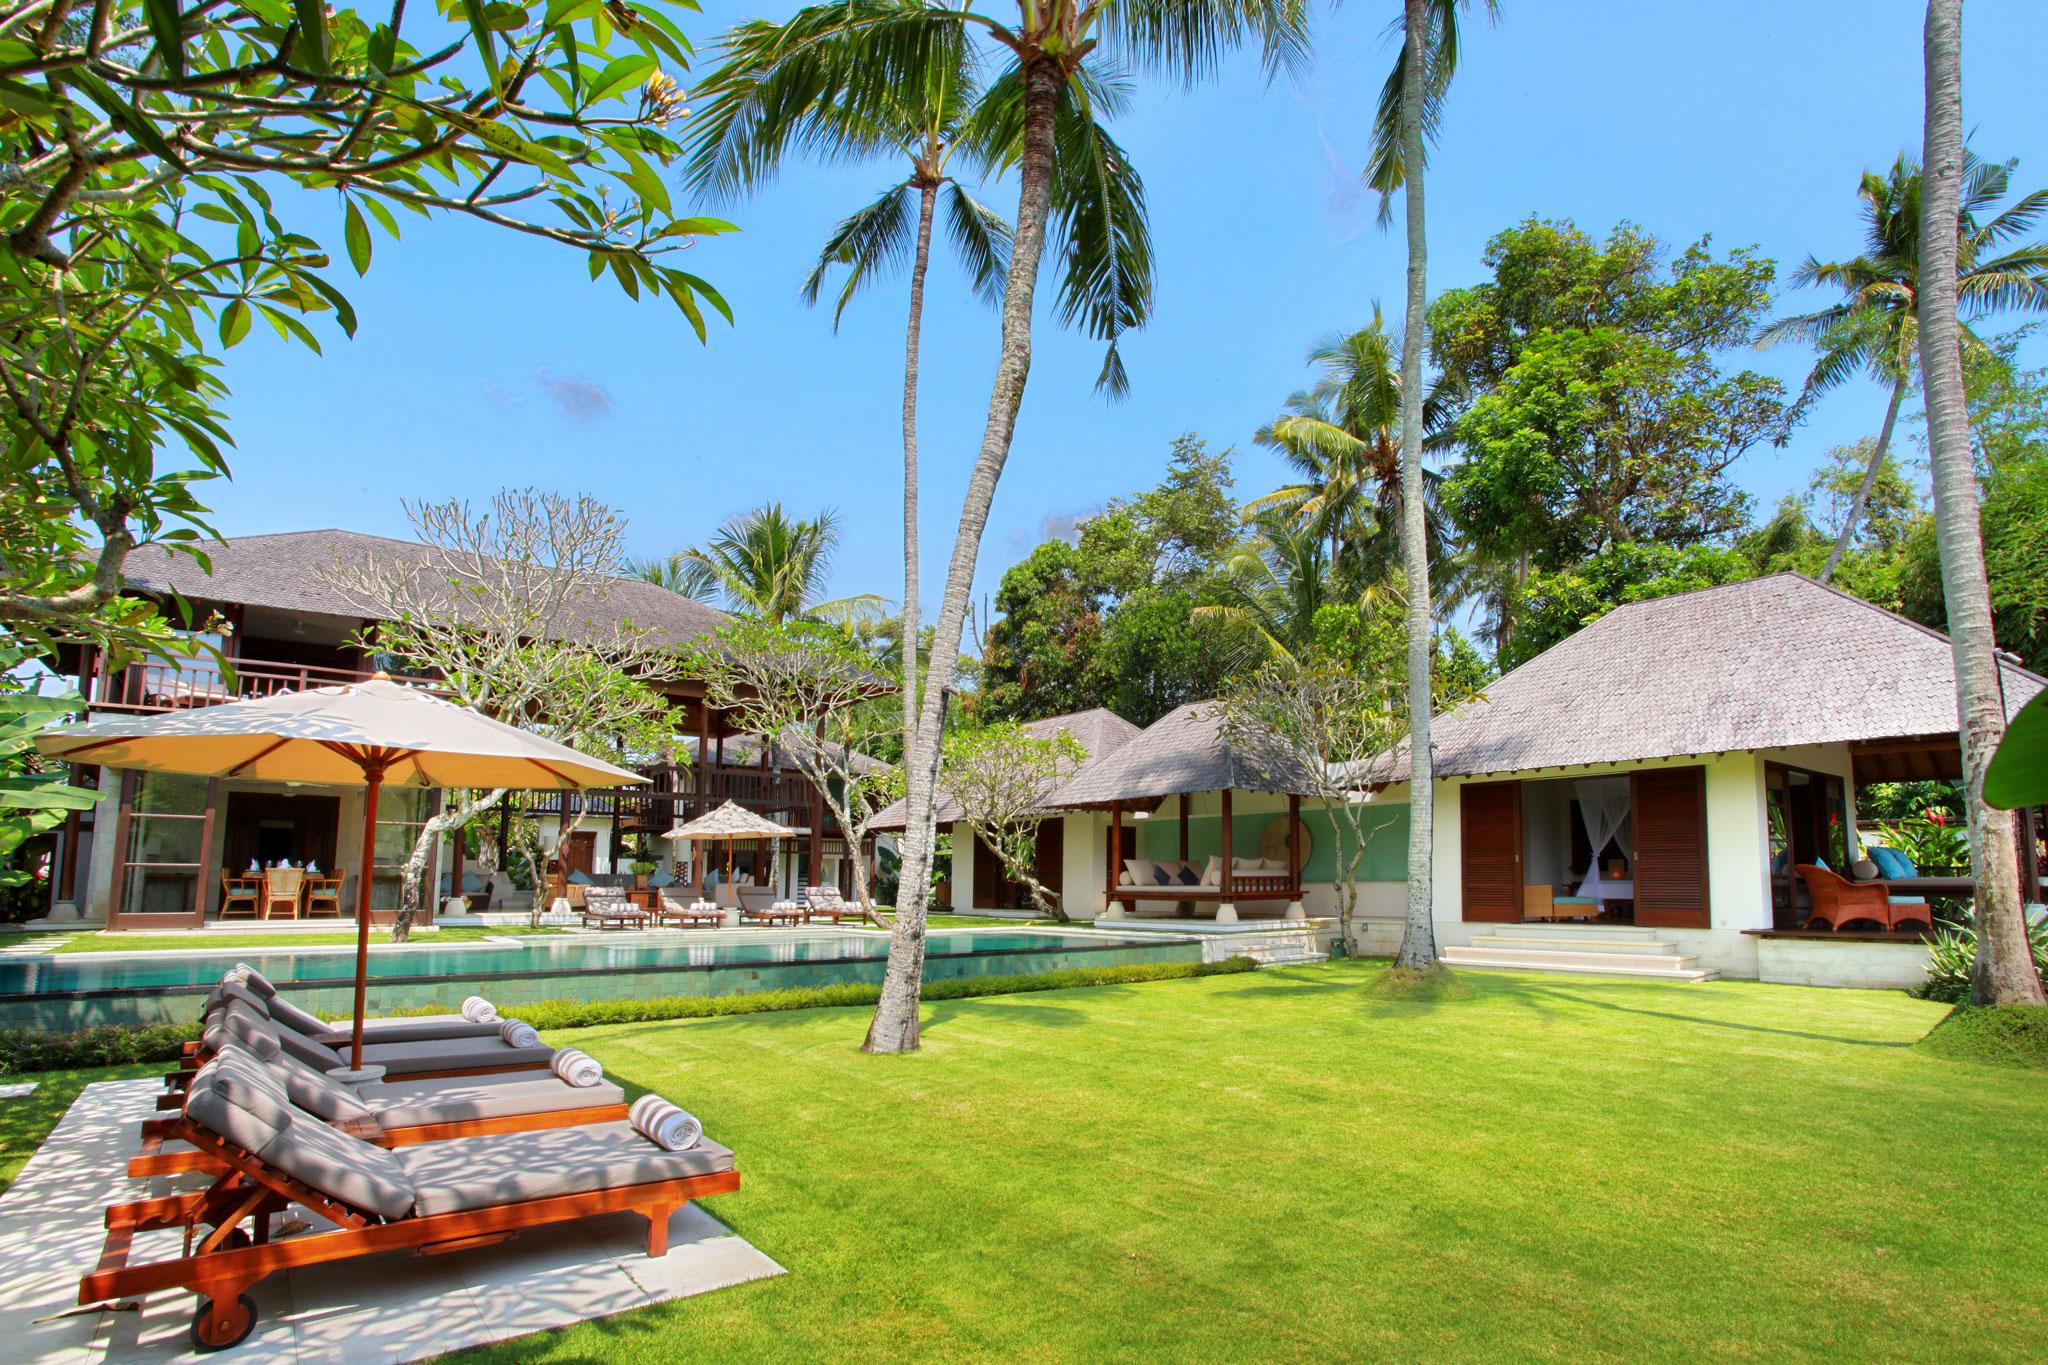 villa-kemah-tinggi-pool-and-garden-7140